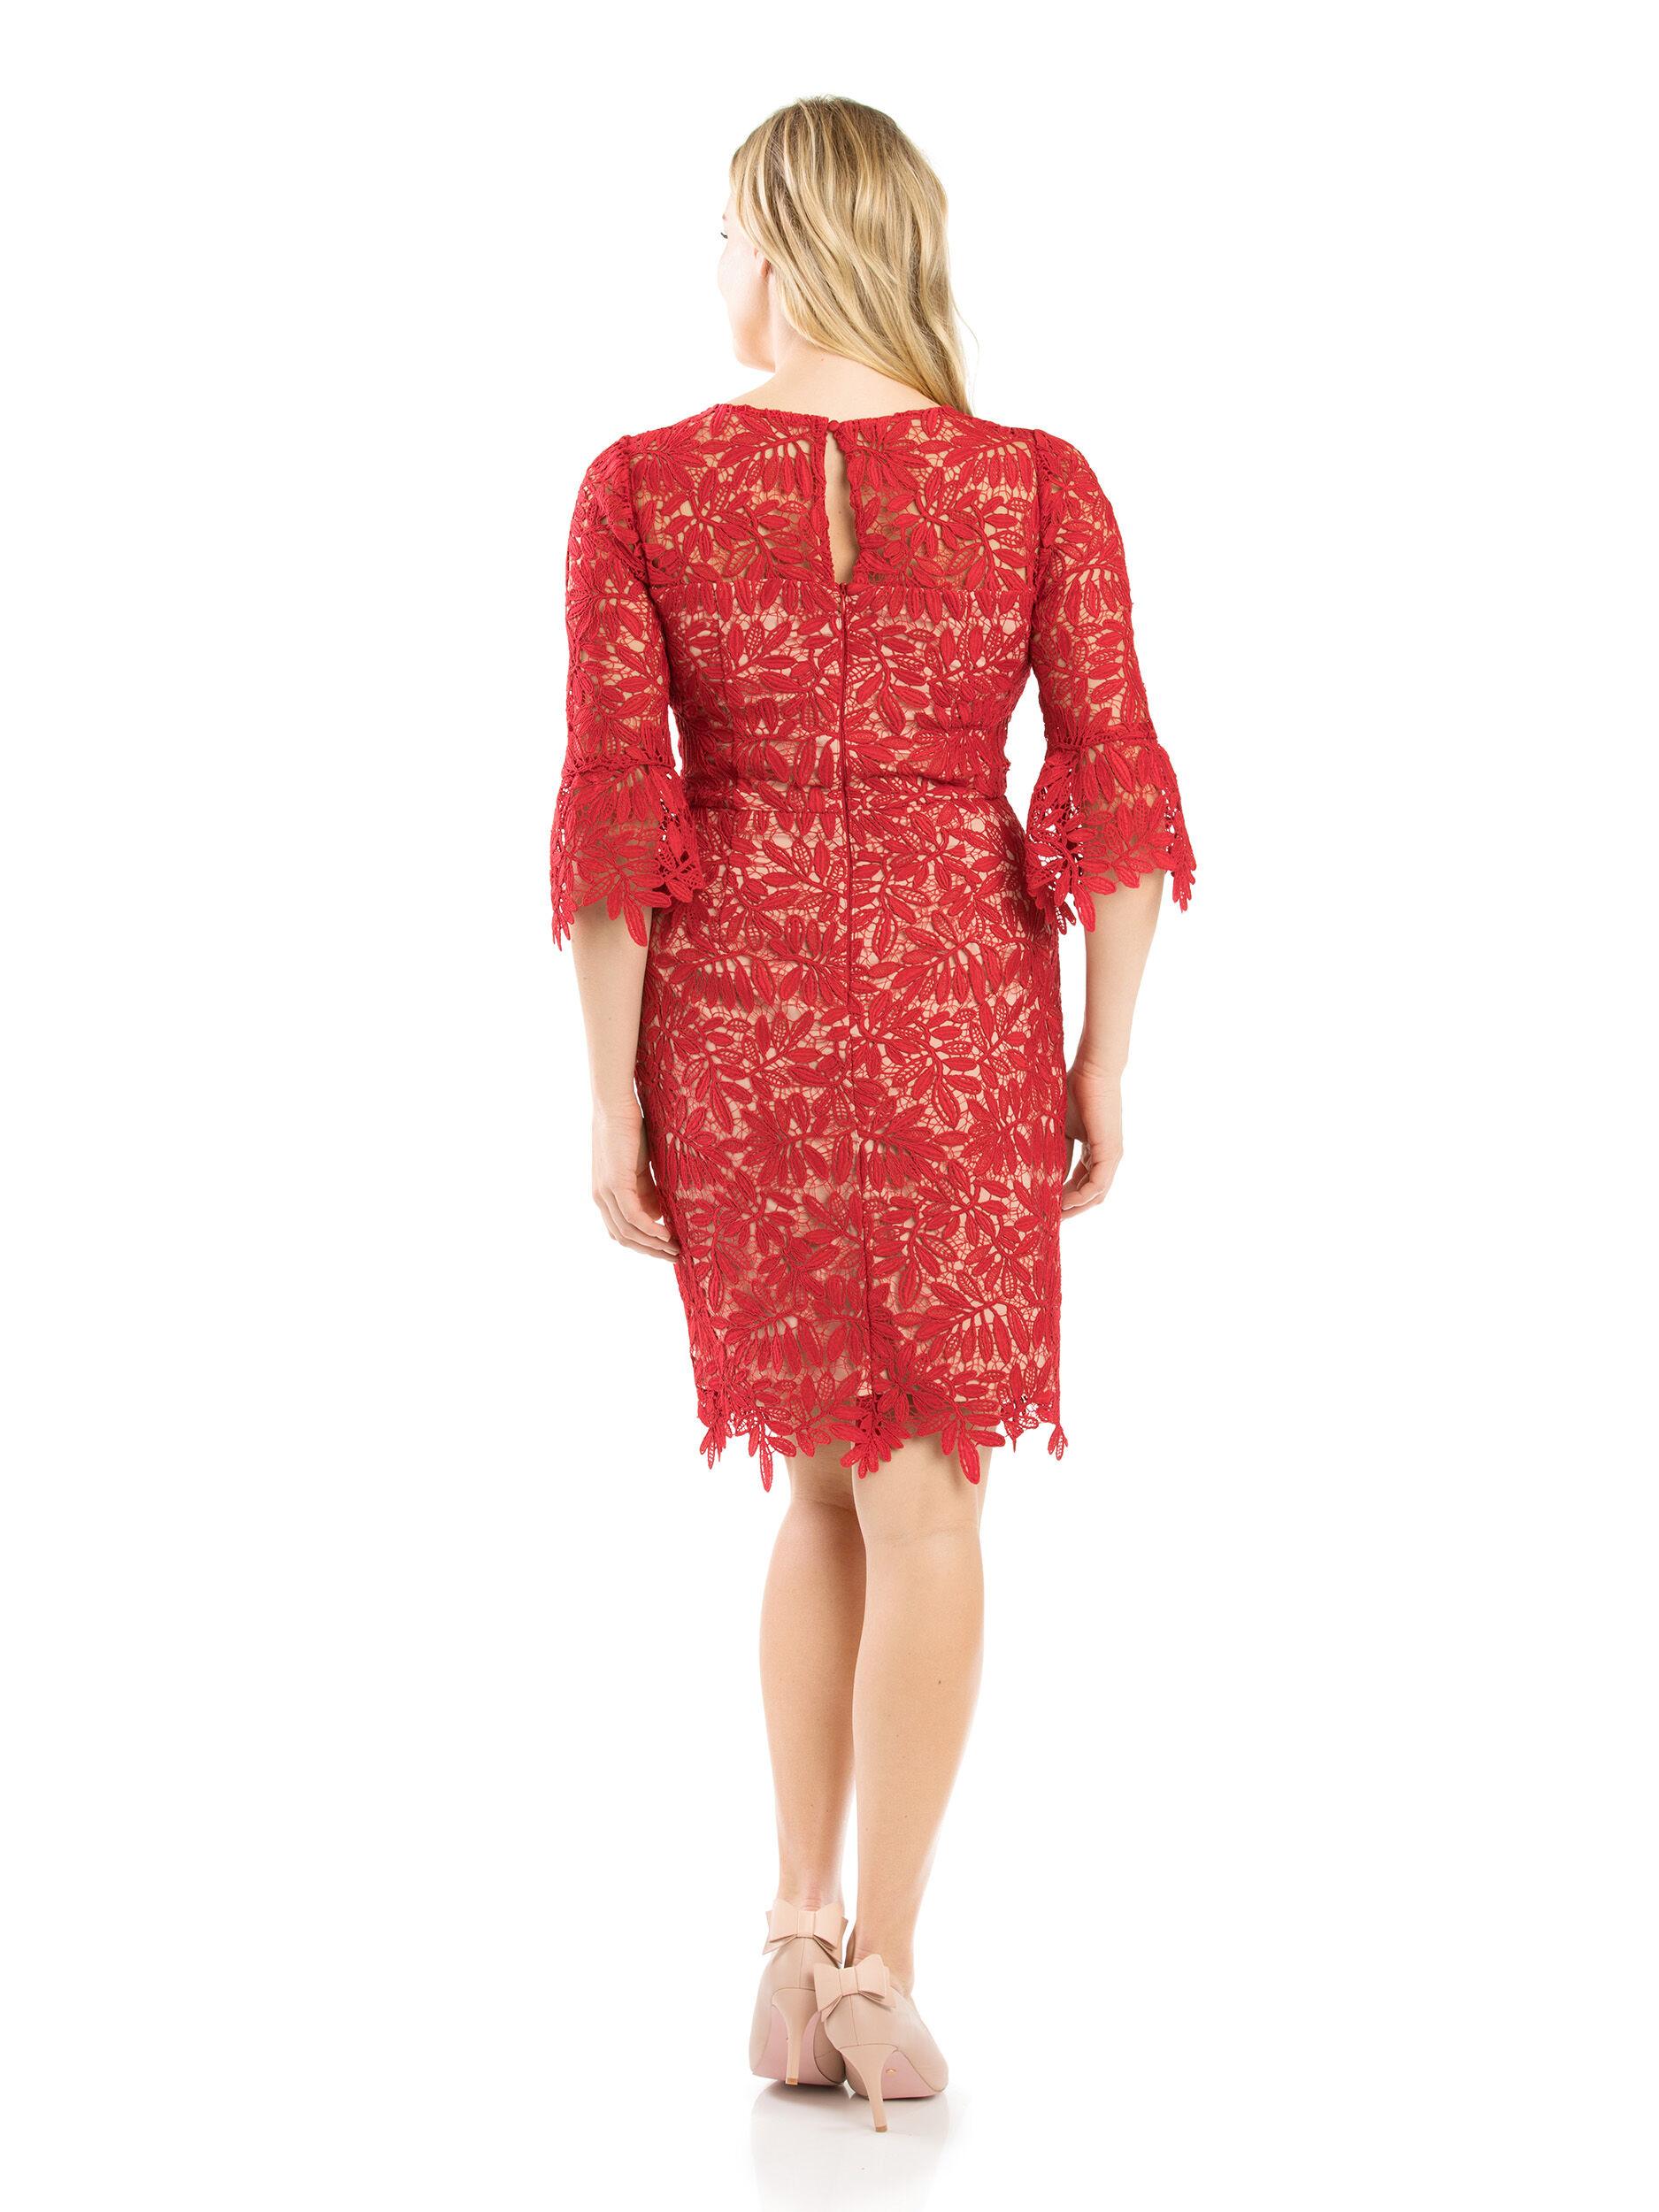 Moroccan Sunrise Dress